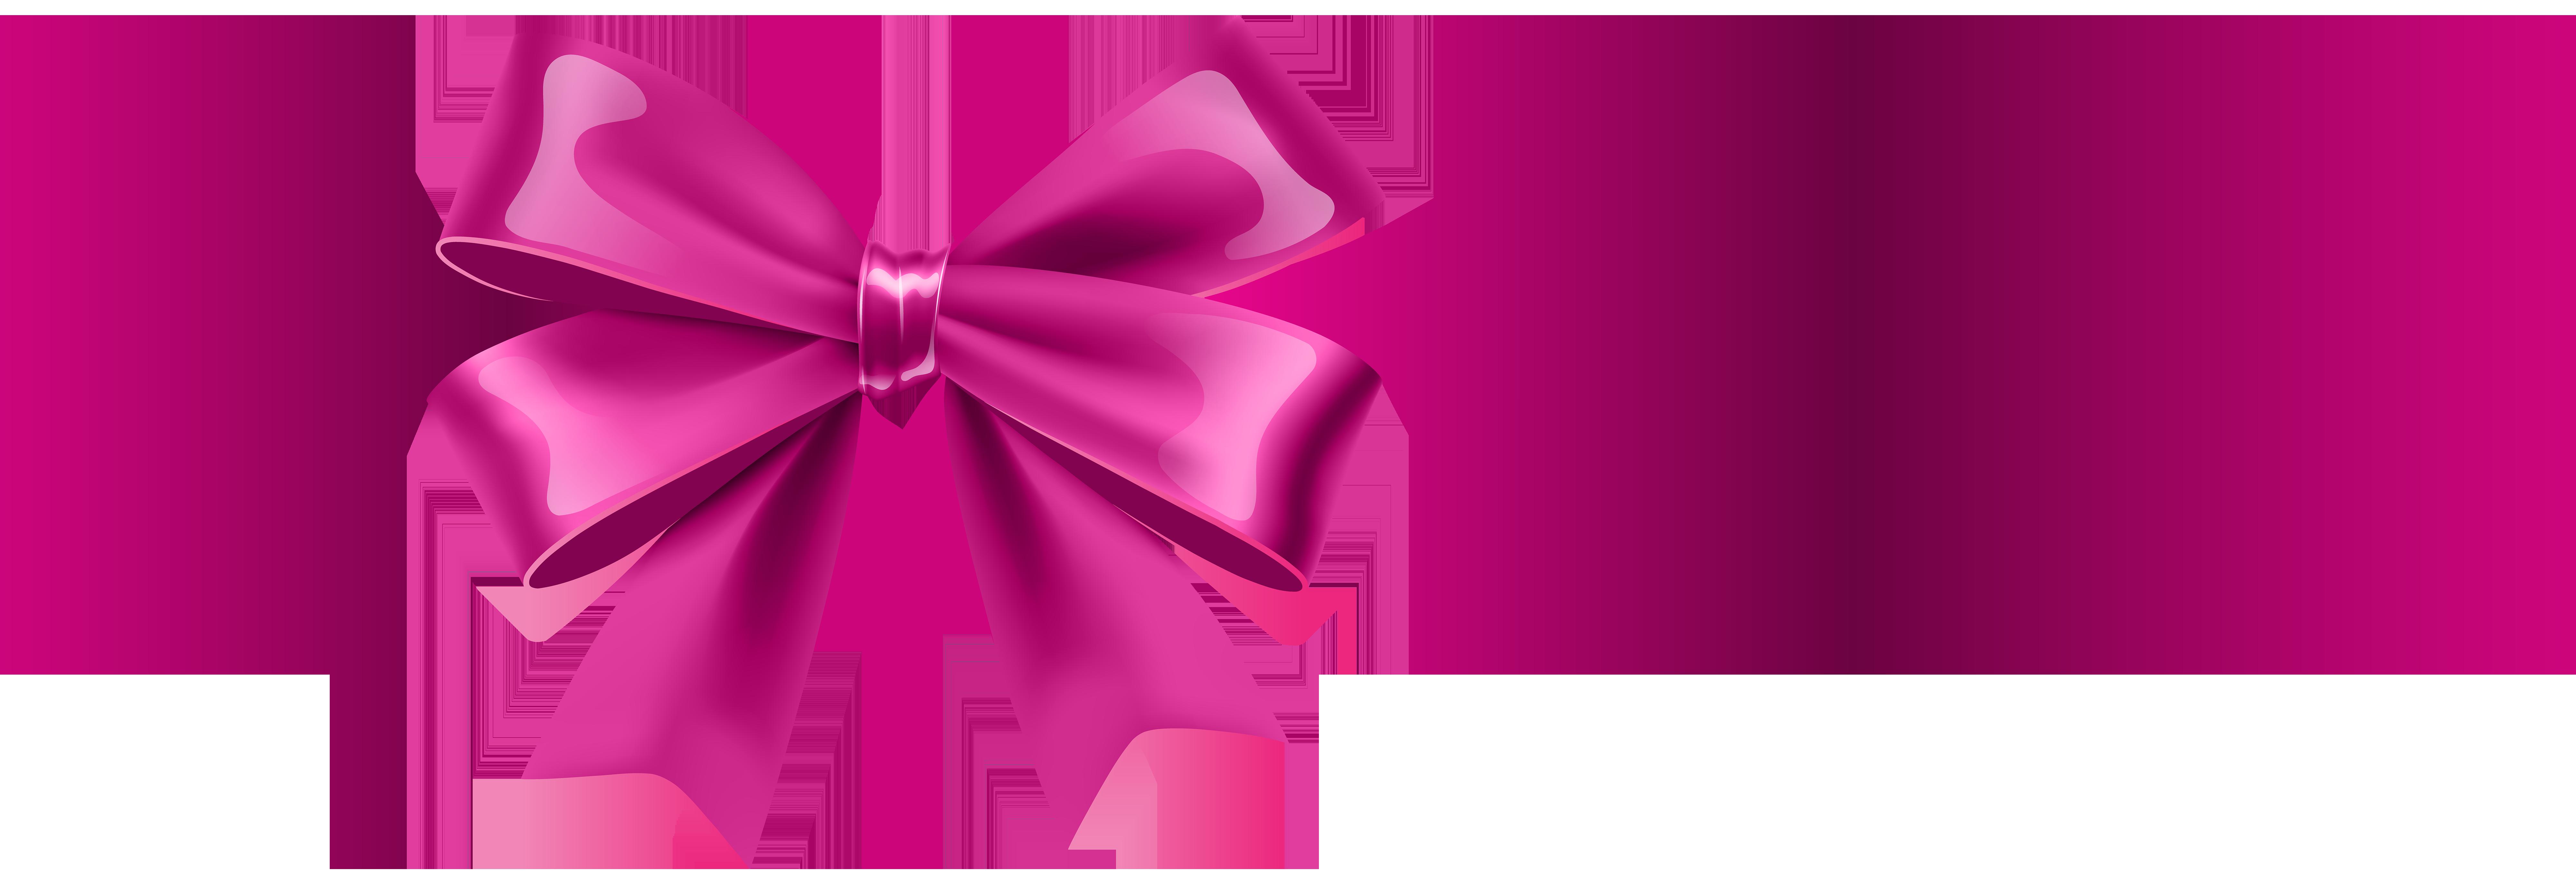 8000x2736 Pink Bow Transparent Clip Artu200b Gallery Yopriceville